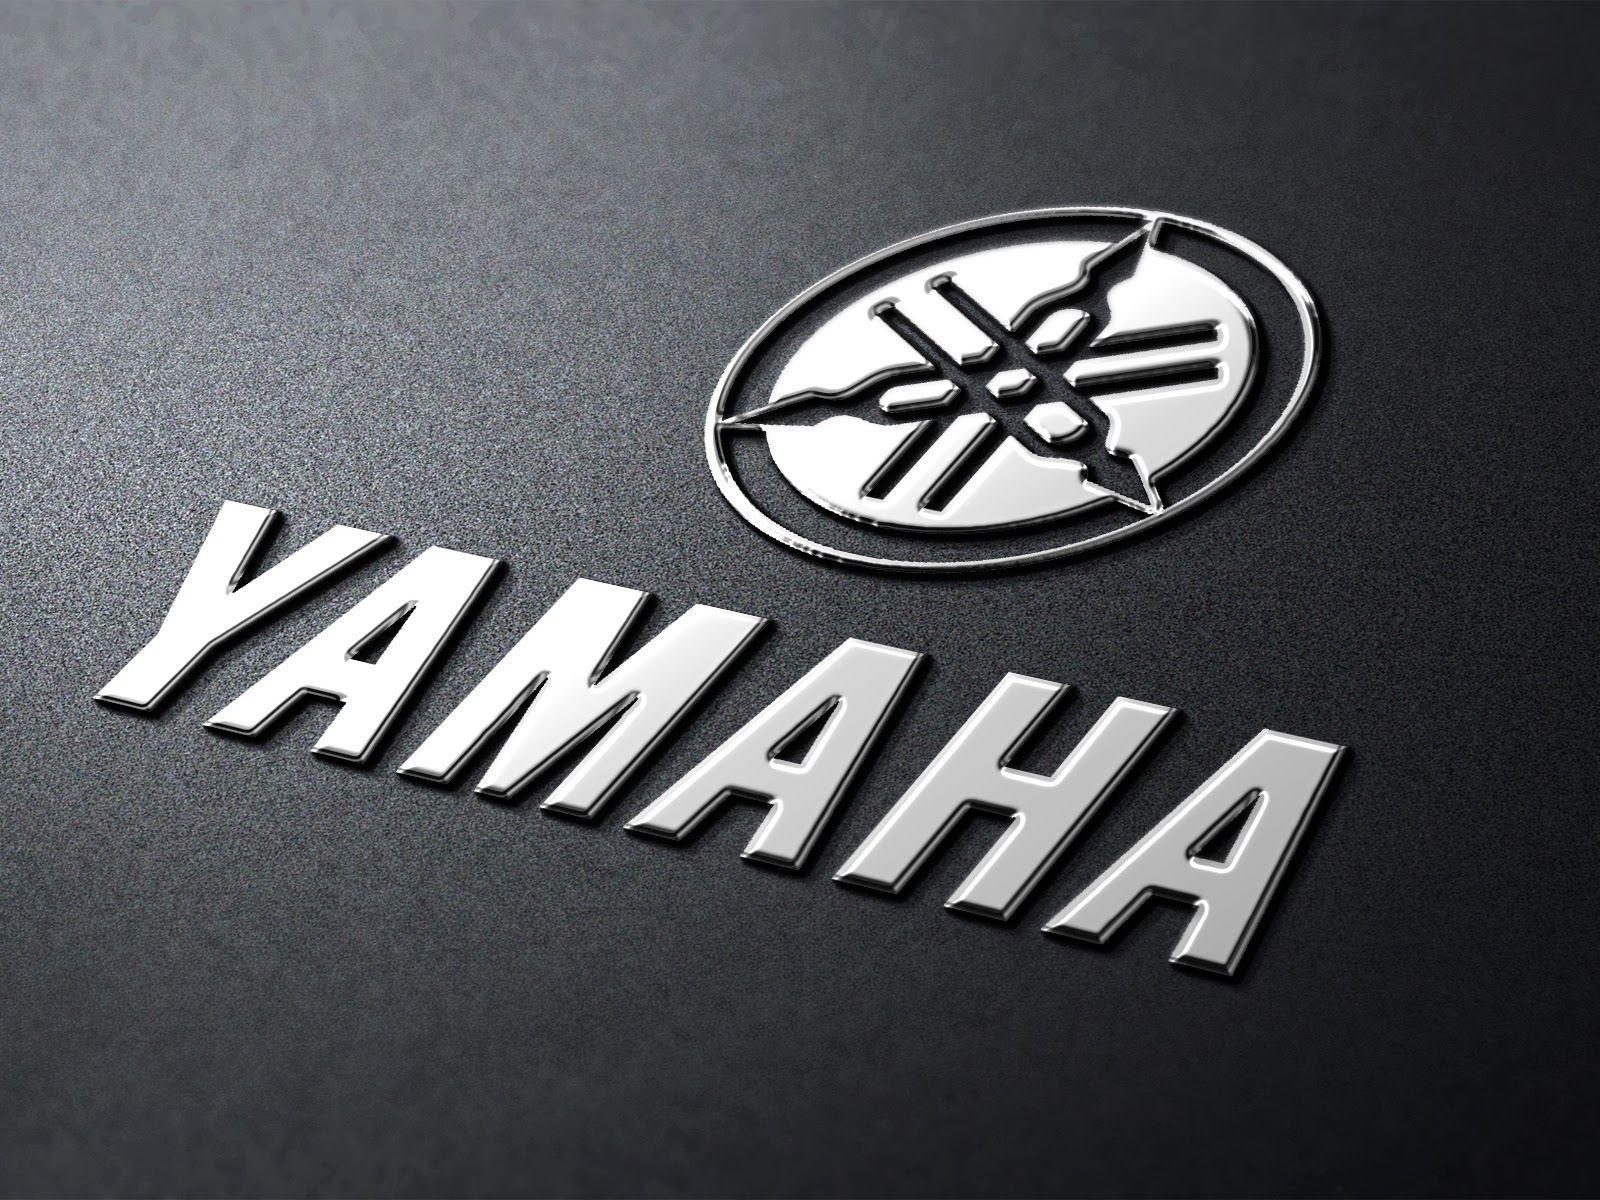 wp2596892-yamaha-logo-wallpaper.jpg